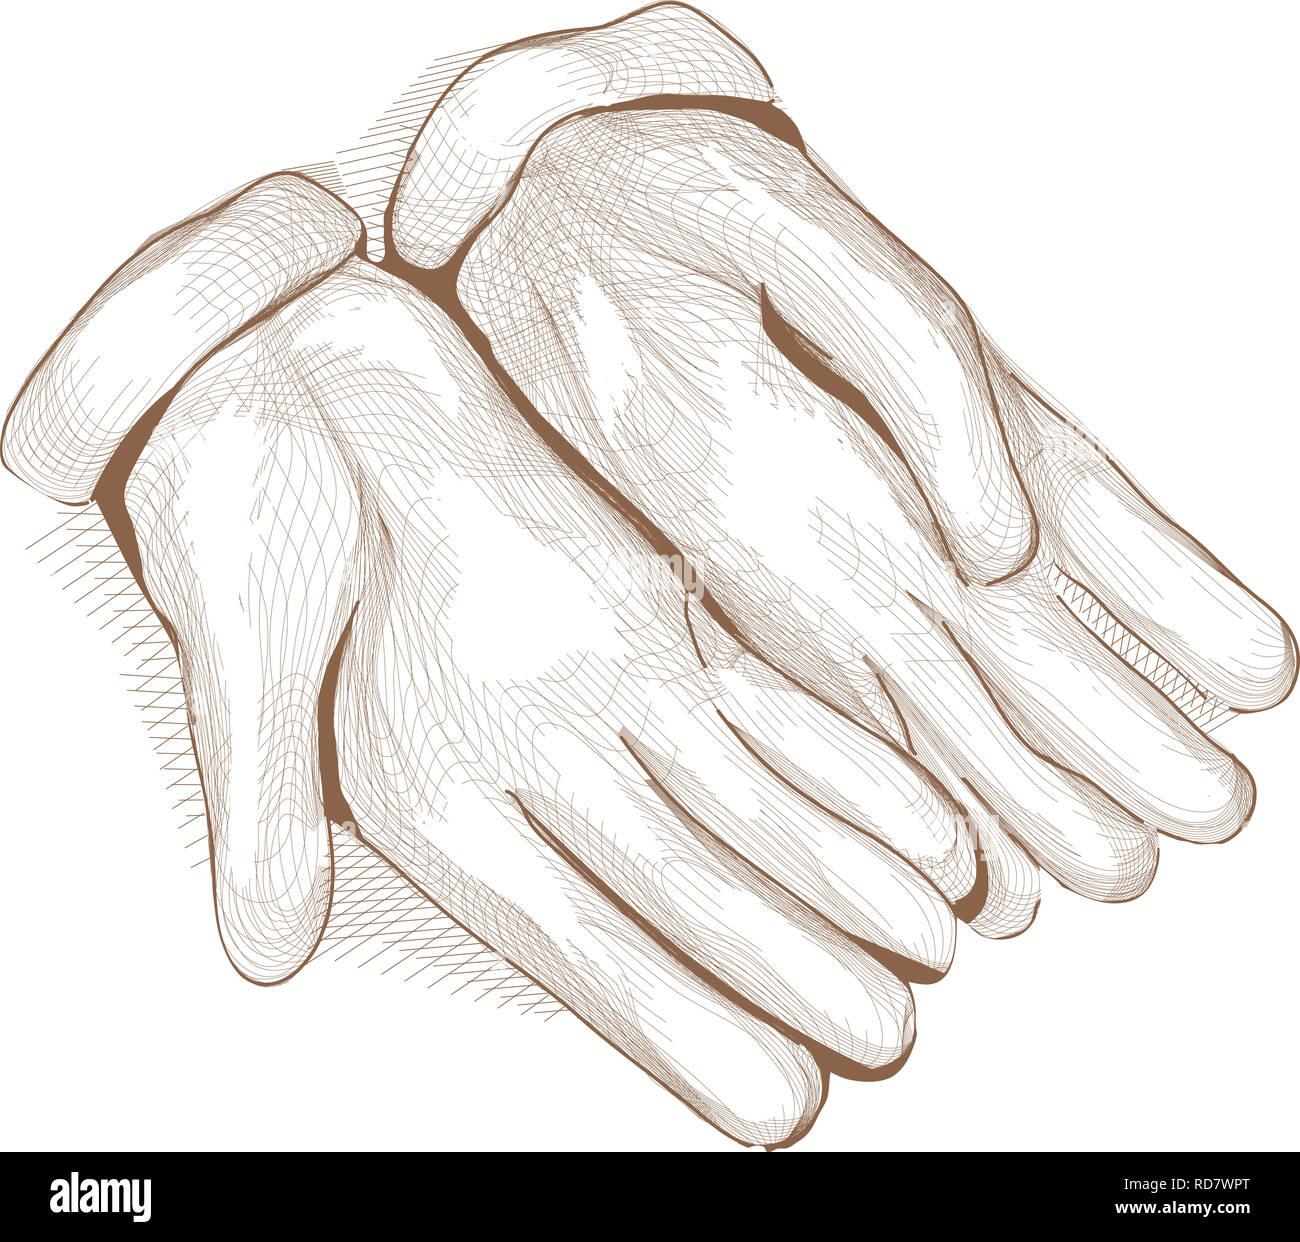 Sketch Illustration of Gardening Gloves. Crosshatching Style